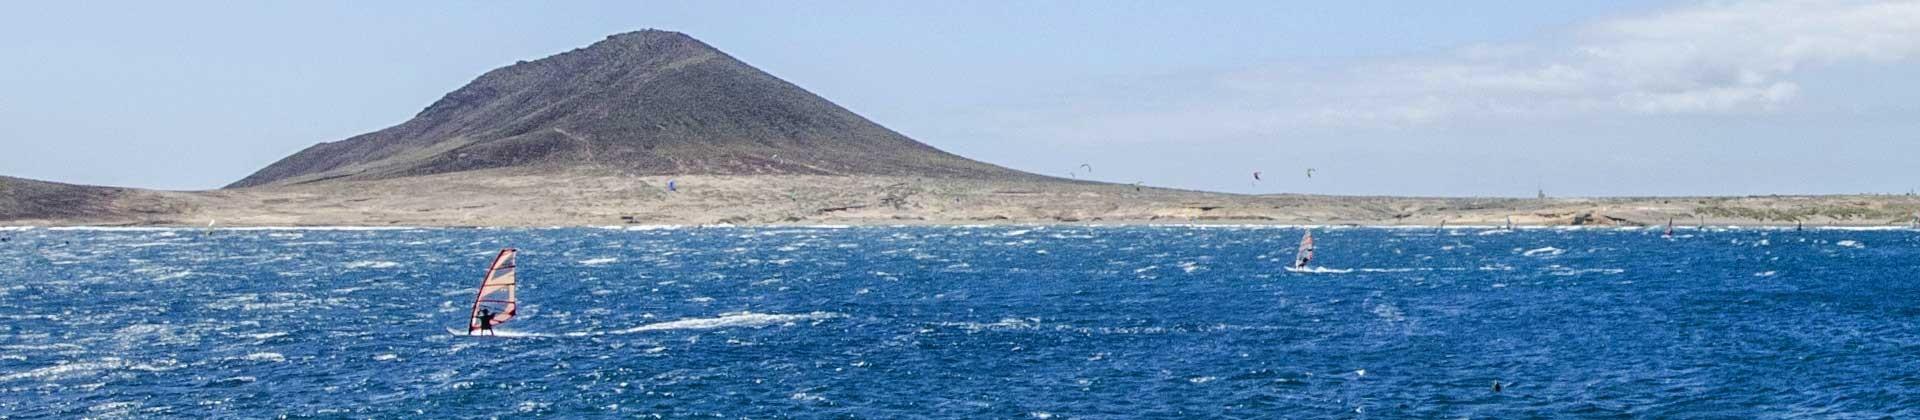 https://www.goodmorningtenerife.com/wp-content/uploads/2014/08/03_slide_windsurfing_GM_Tenerife-1920x420.jpg